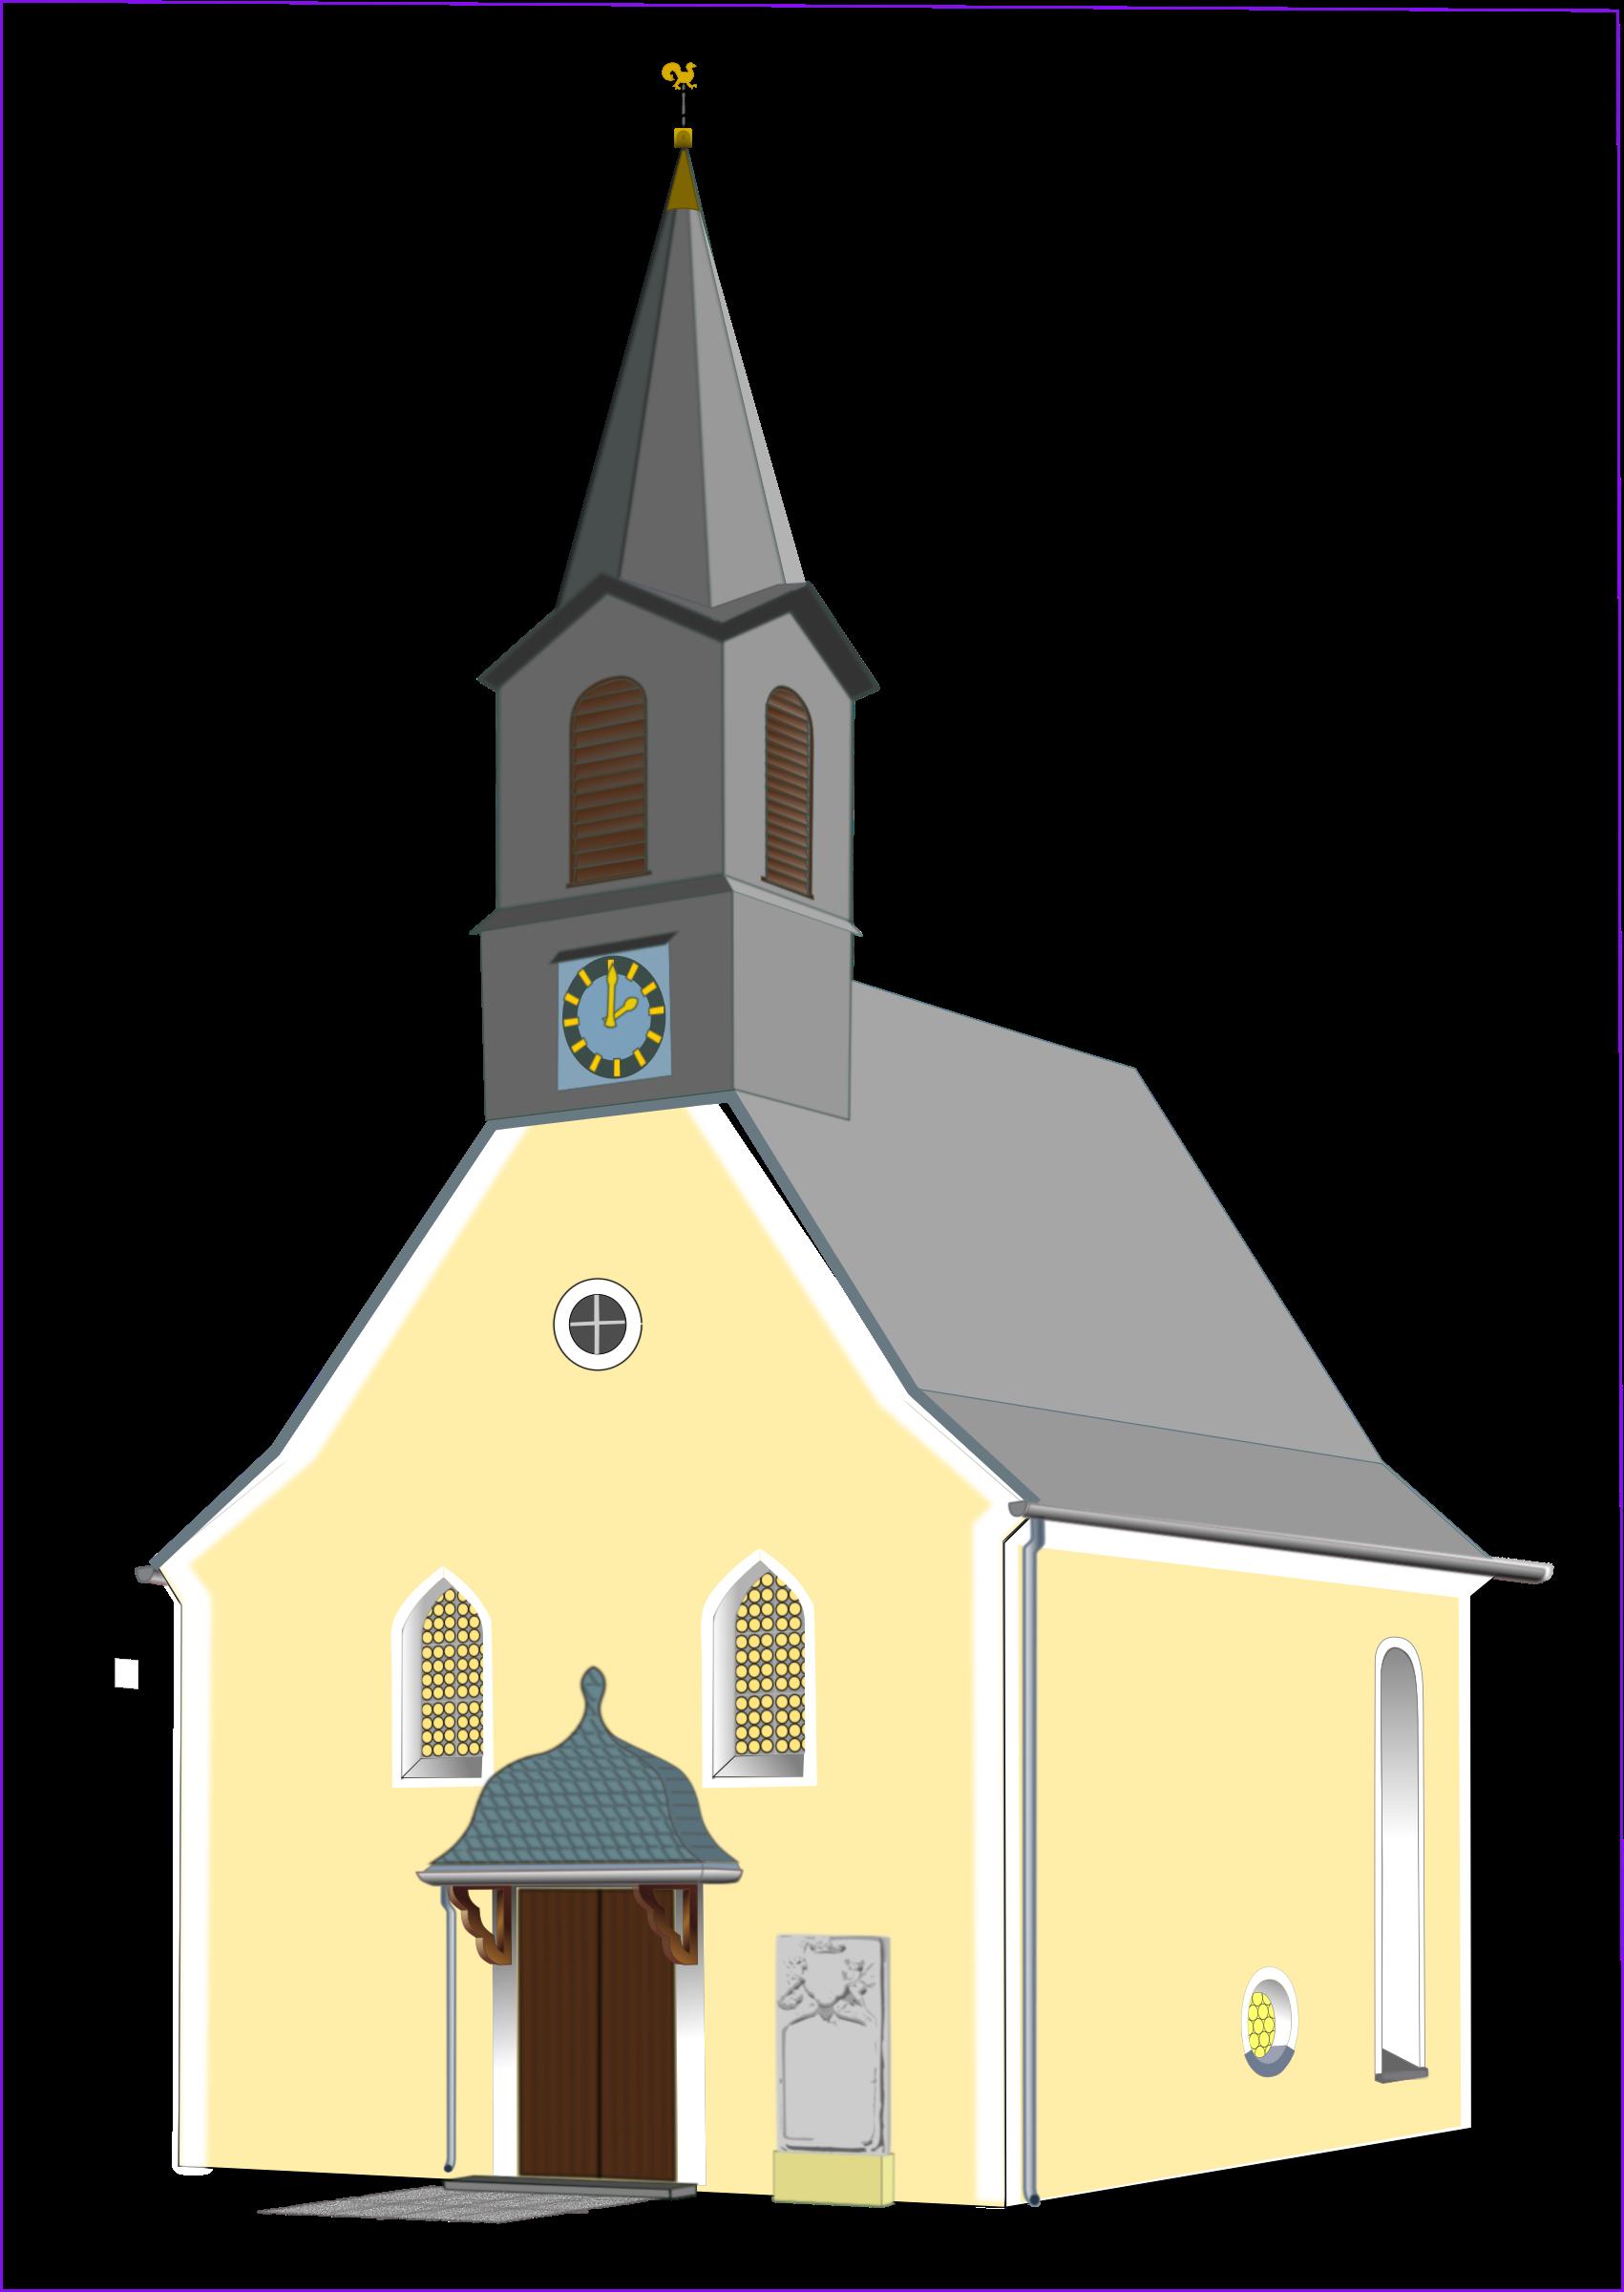 Free Church Png Hd  - Church Png Pic, Transparent background PNG HD thumbnail